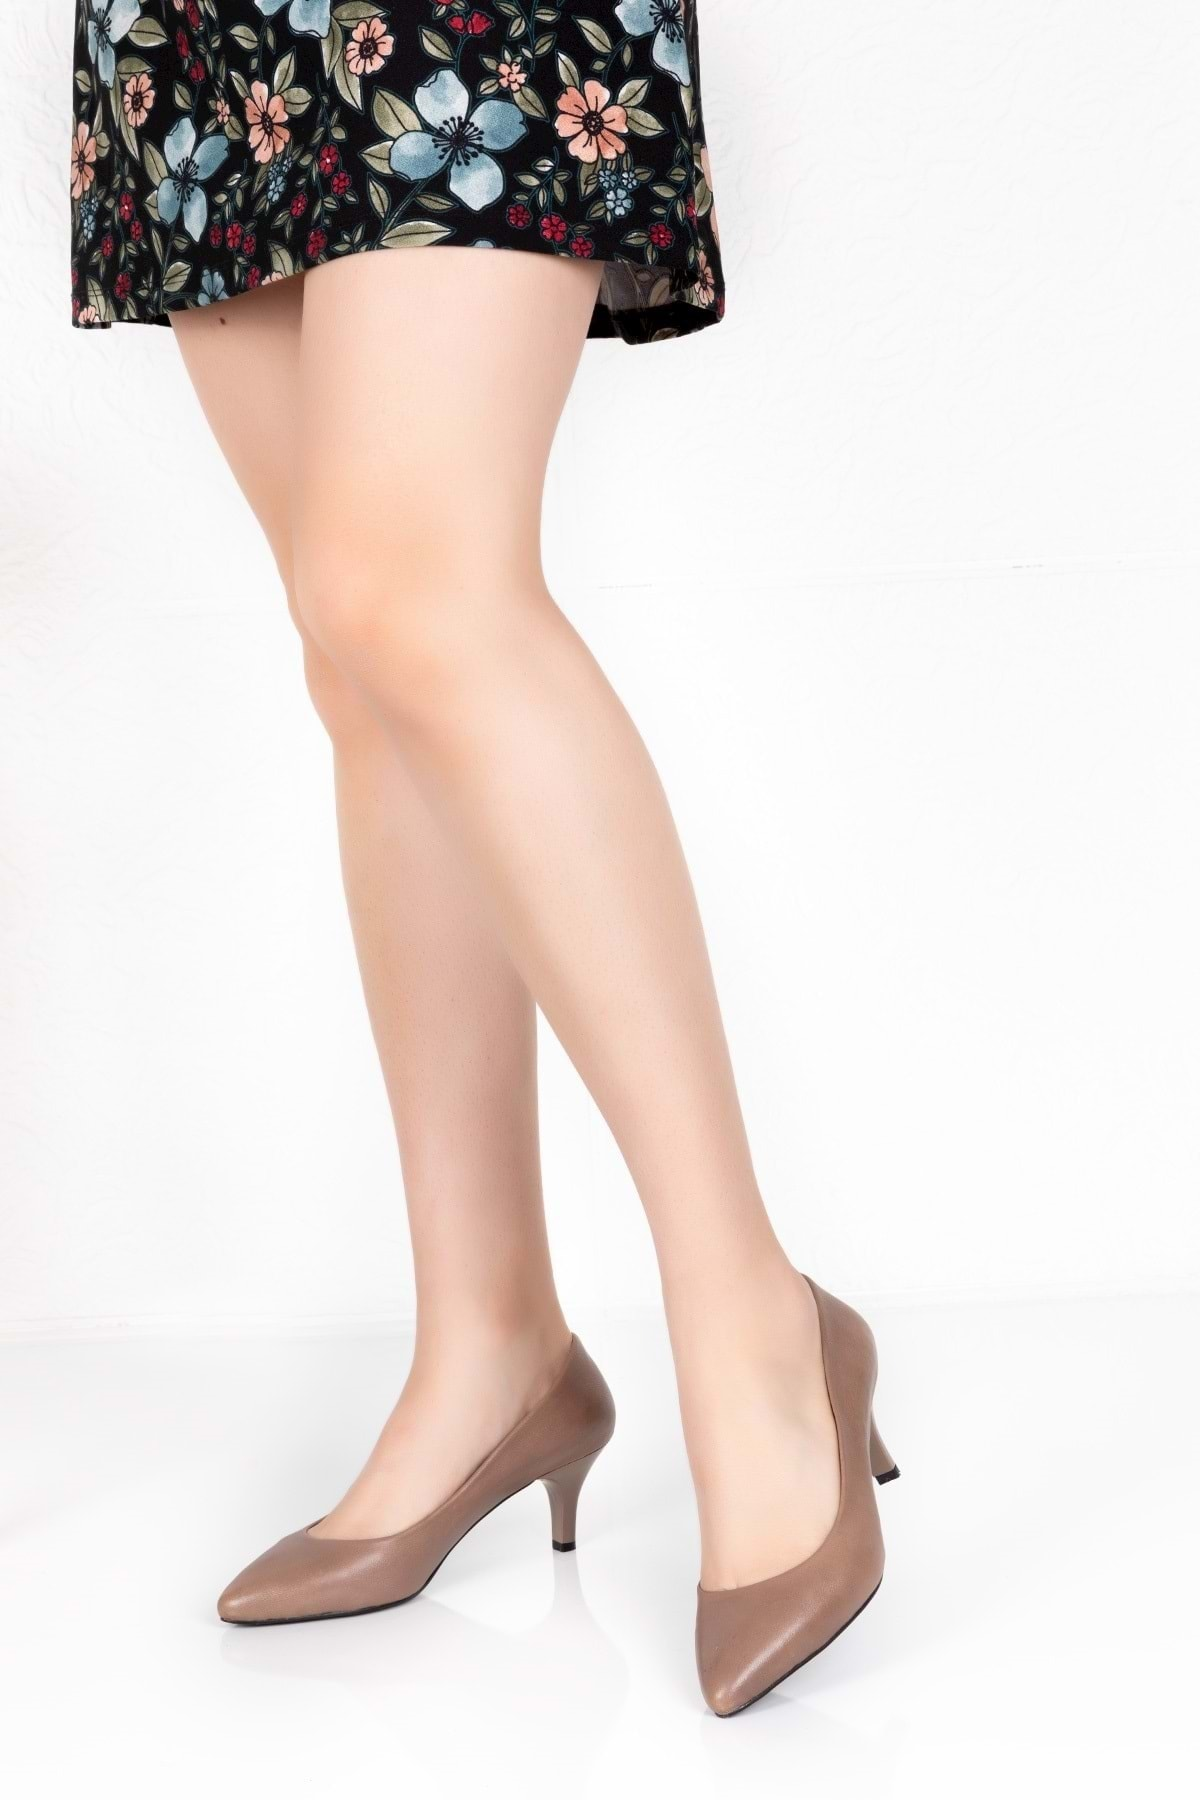 Gondol Kadın Vizon Deri Orta Topuk Stiletto vdt.23 2